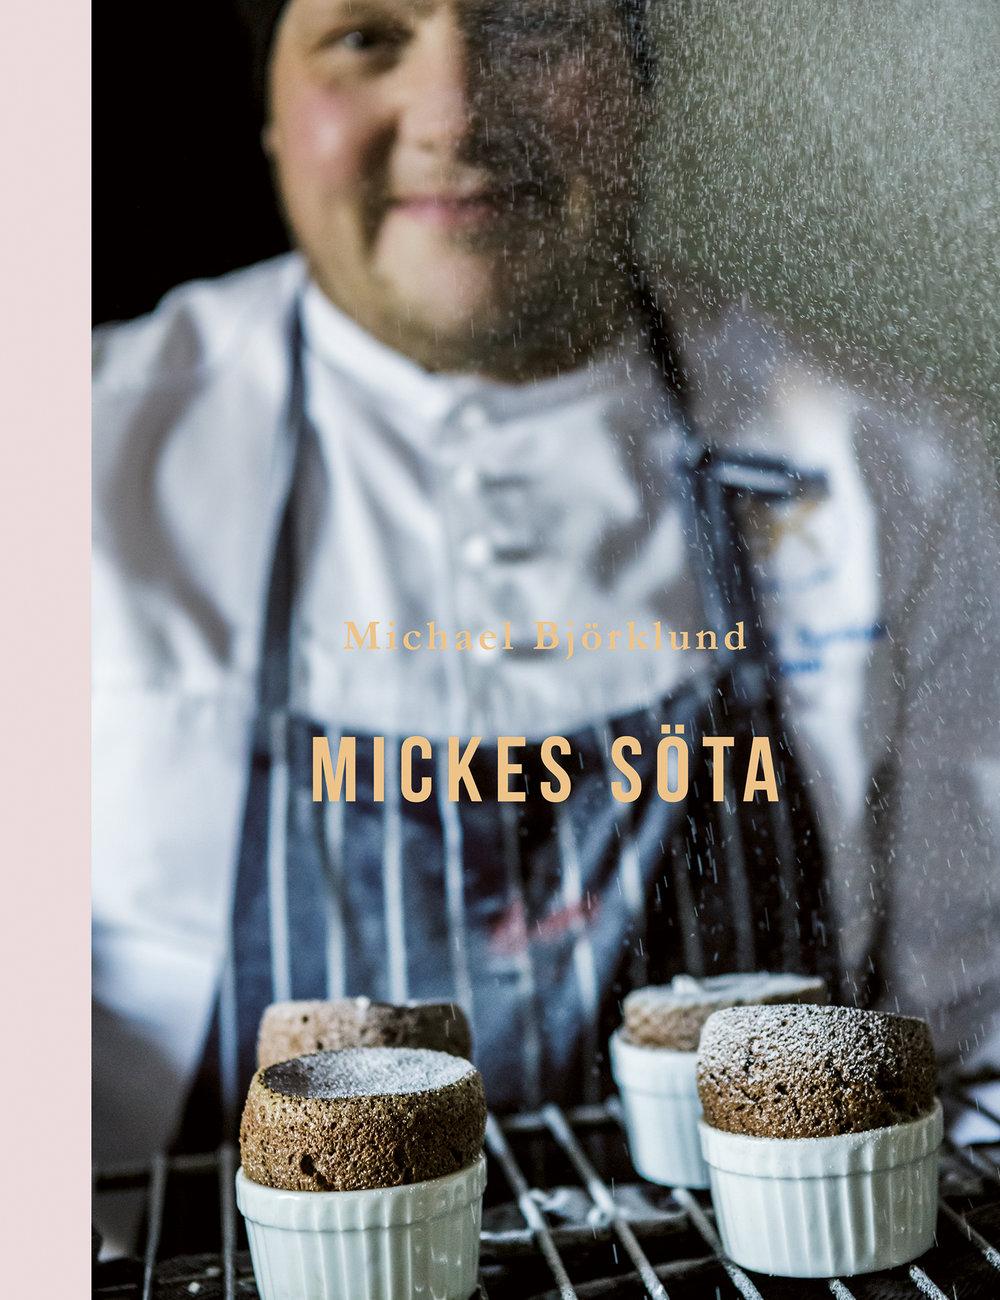 mickessota-9789526765730.jpg